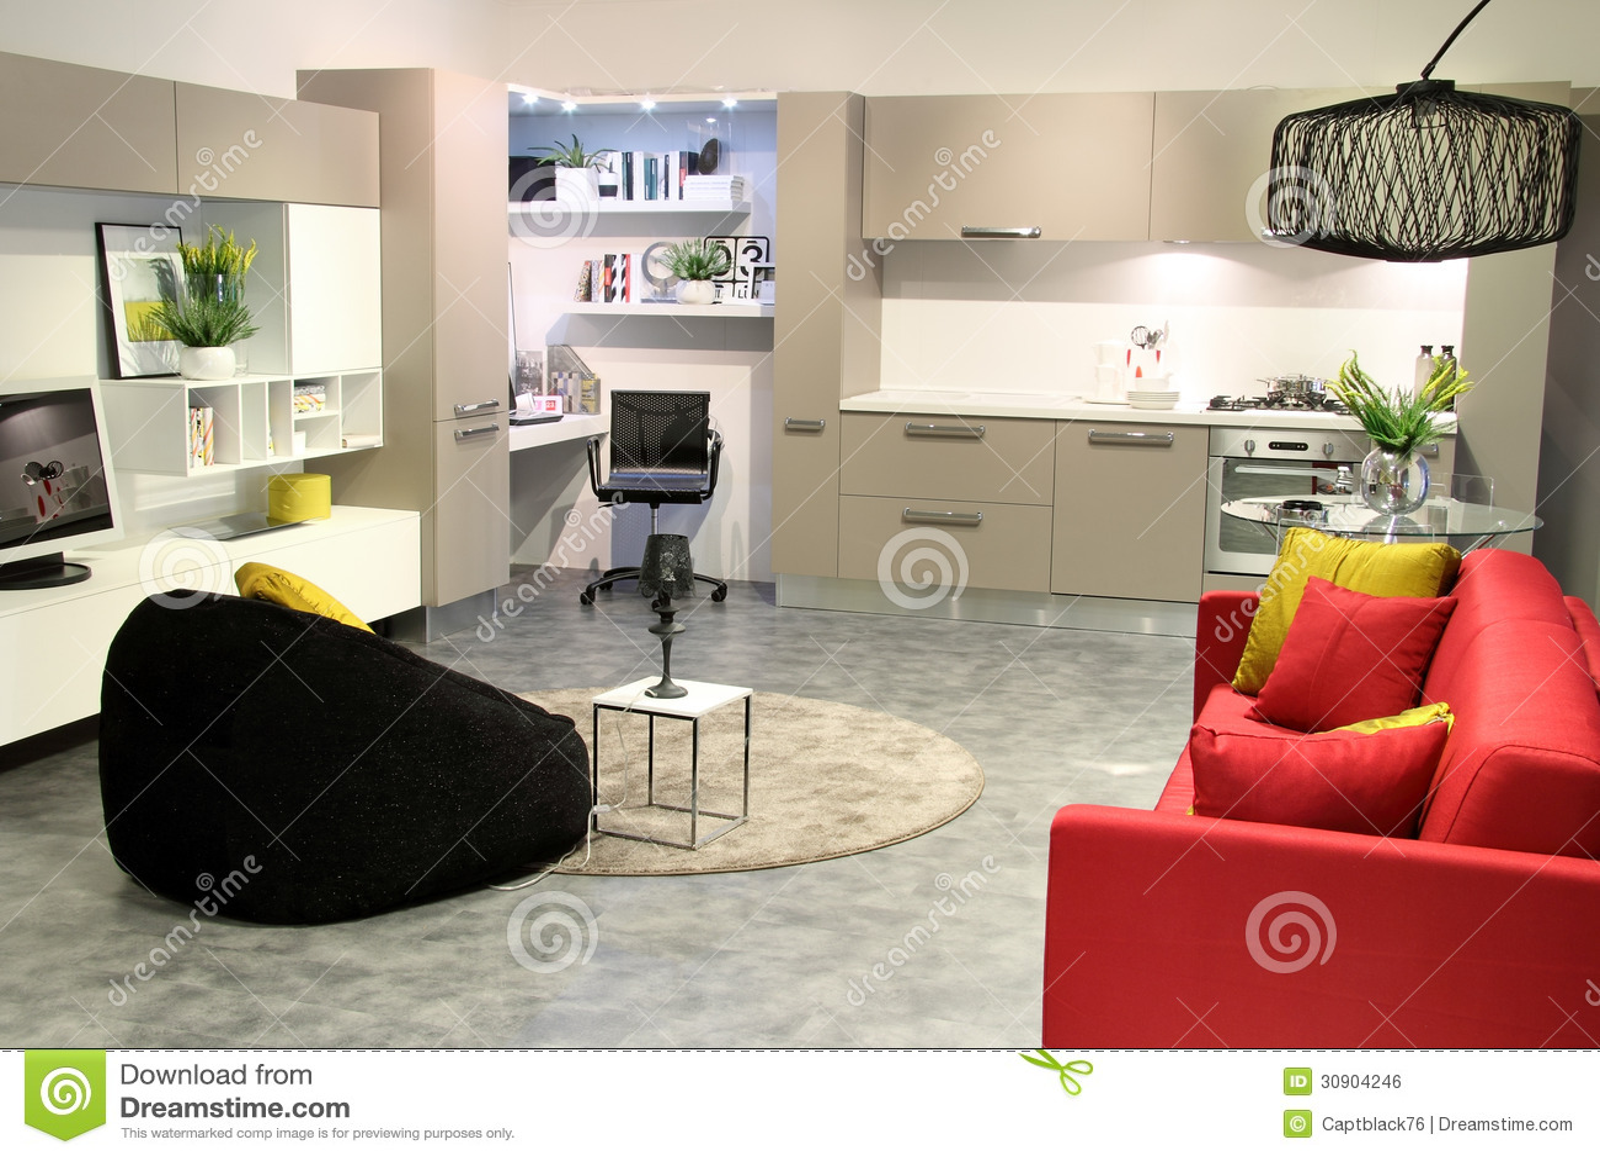 Kleurrijke moderne keuken en woonkamer royalty vrije stock afbeelding afbeelding 30904246 - Woonkamer en moderne keuken ...